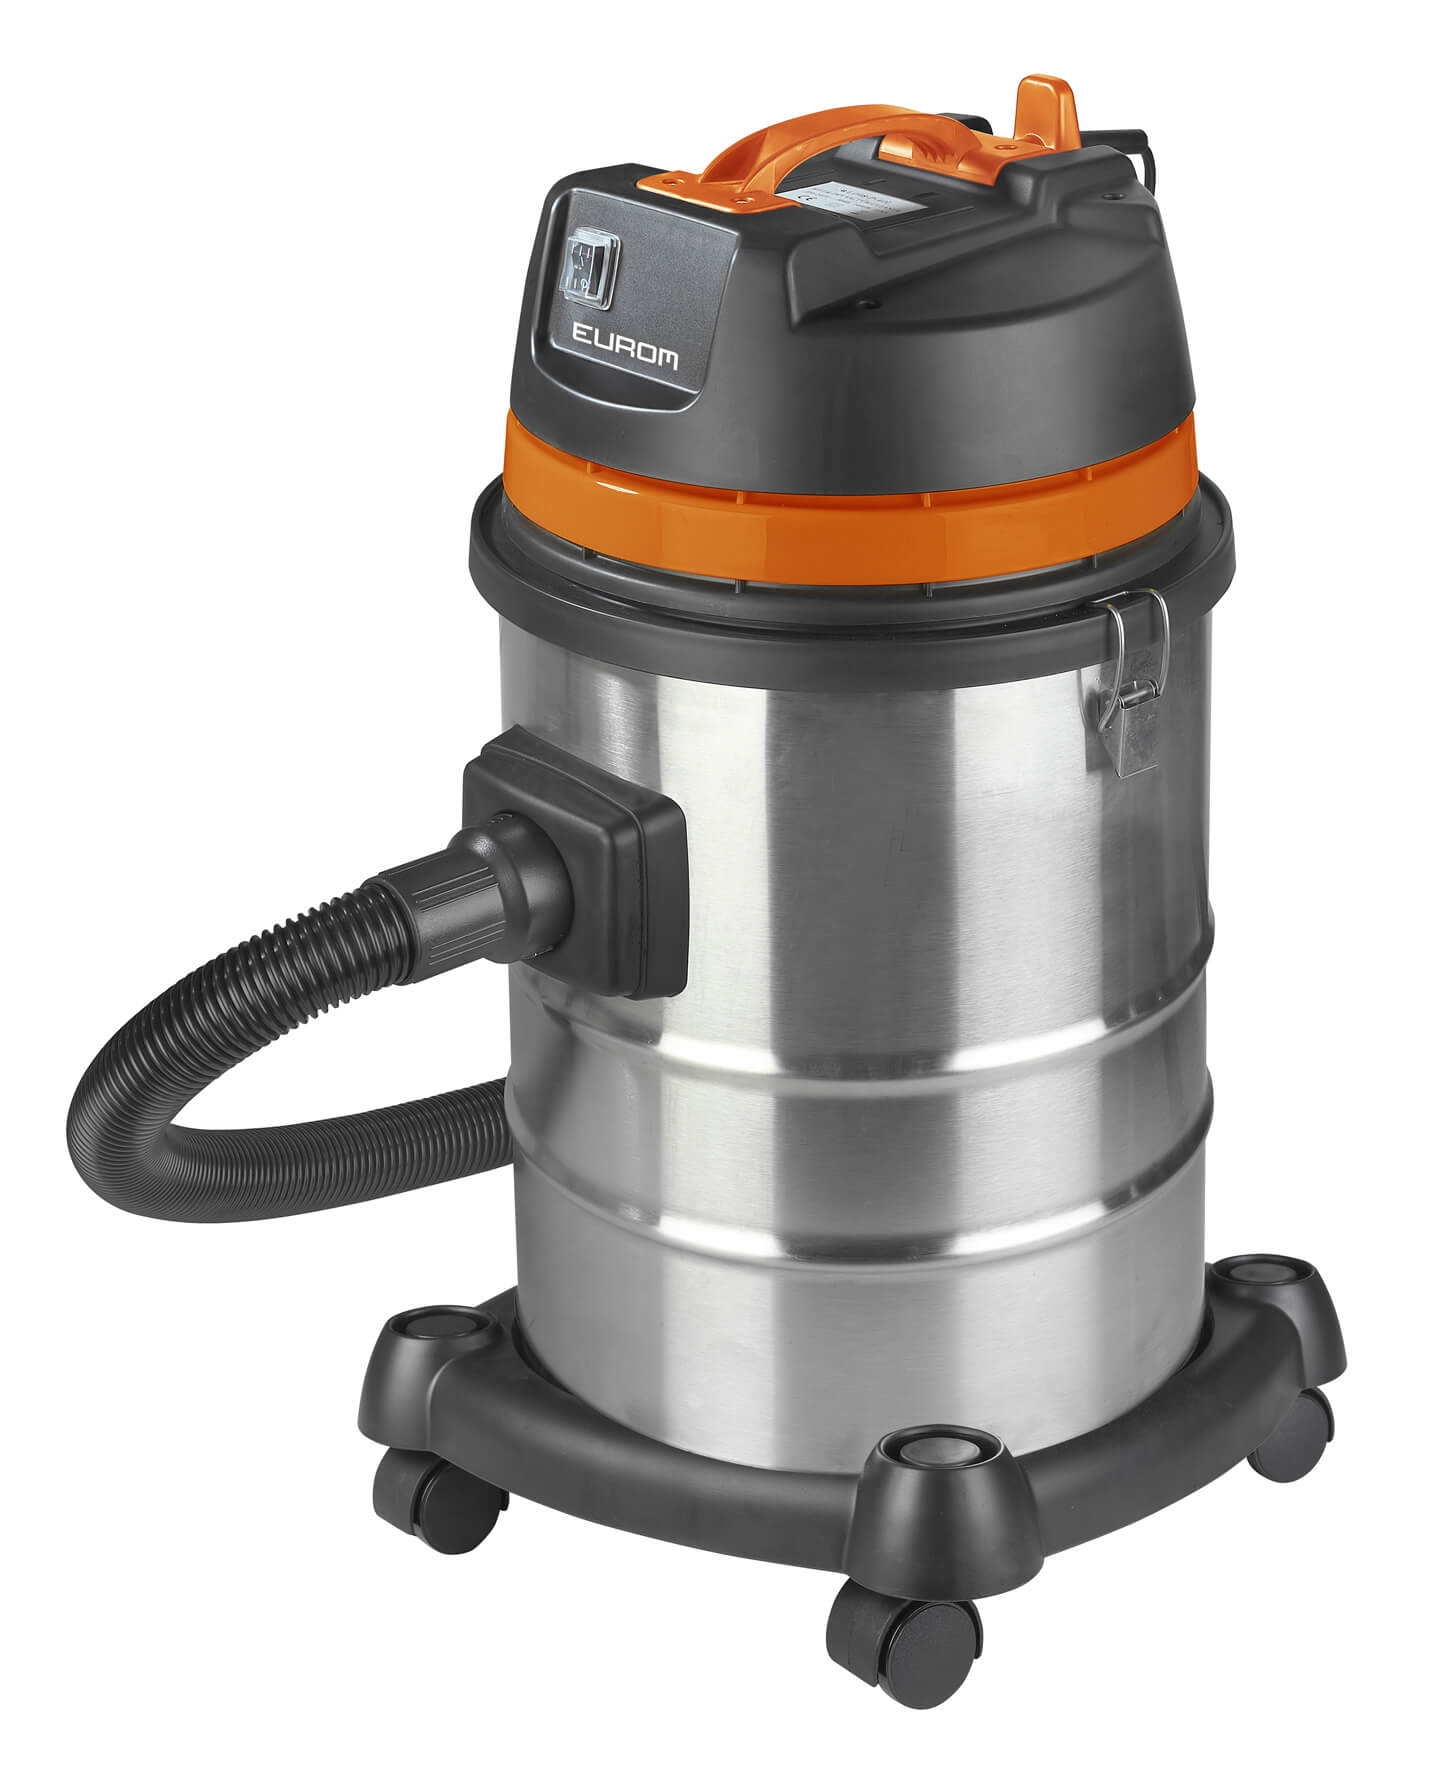 Eurom Force 1240 Alleszuiger 1200W | Stof en waterzuiger 40 liter ketel semi prof